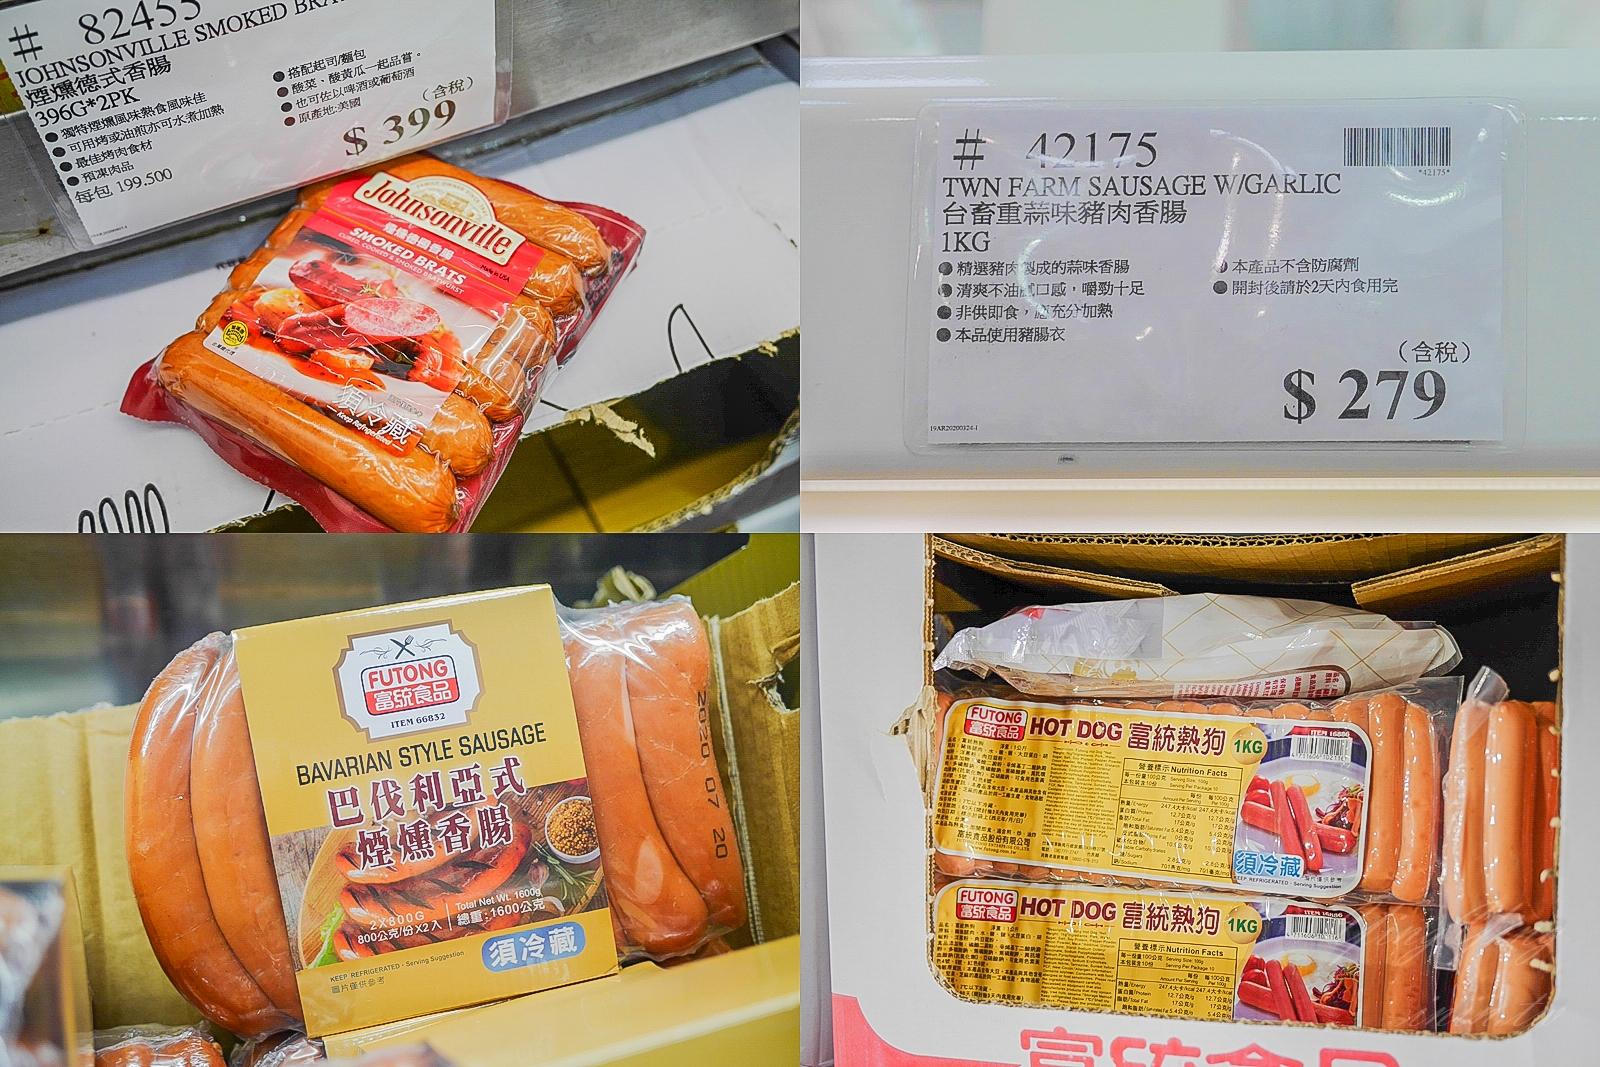 COSTCO烤肉必買食材~超過50種烤肉食材任你選擇【最齊全】 - 盈盈 棉花糖女孩